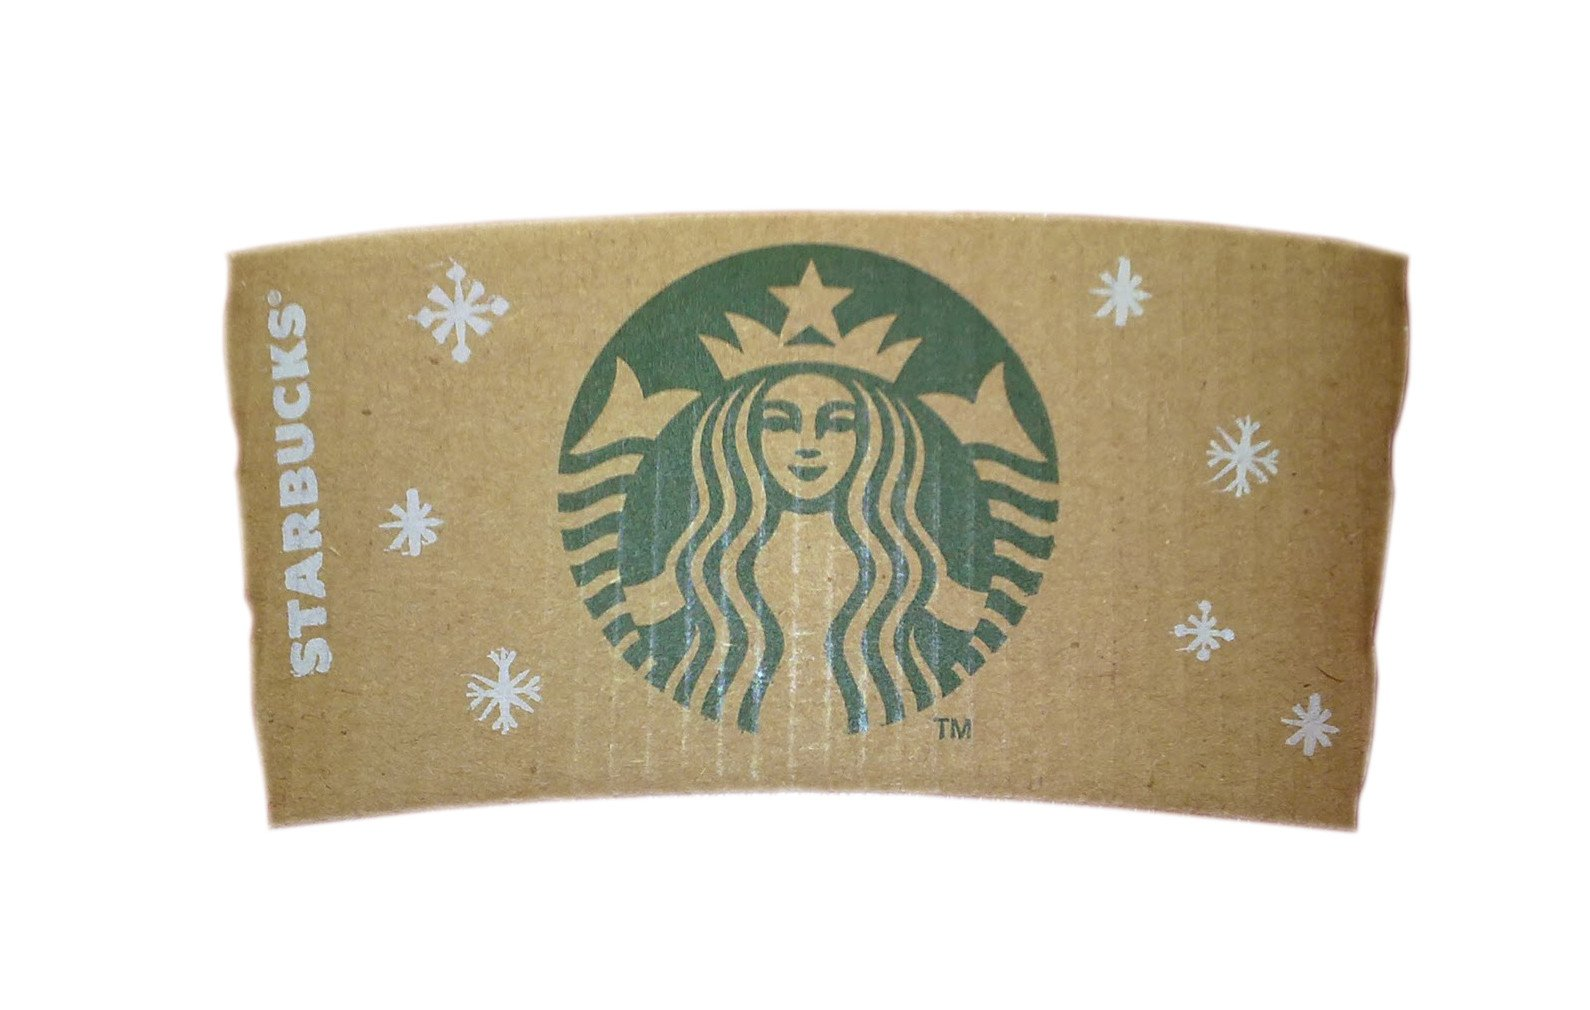 Starbucks Sleeve Template Dinner Menu Templates Cake Ideas and Designs